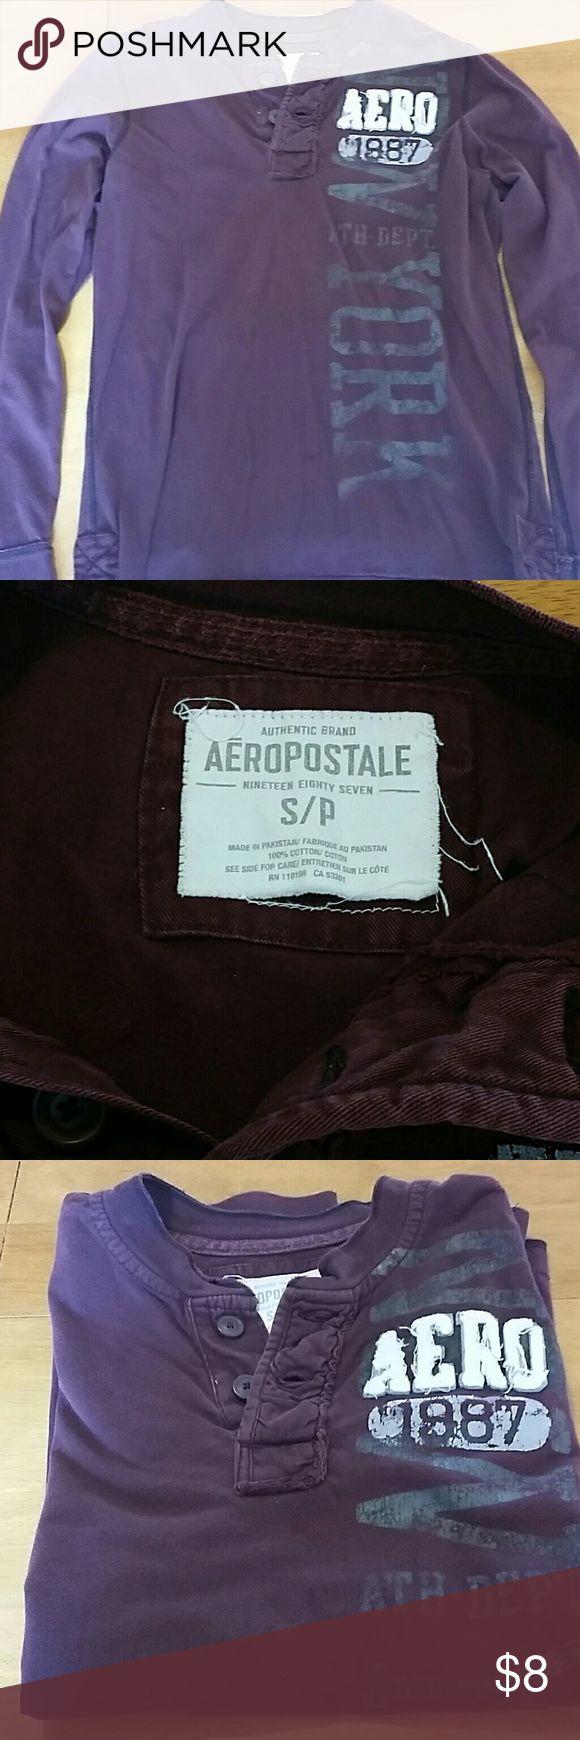 Mens AERO long sleeve shirt Mens Aeropostale long sleeve shirt, size small,no tears, no stains, deep burgandy color. Aeropostale Shirts Tees - Long Sleeve